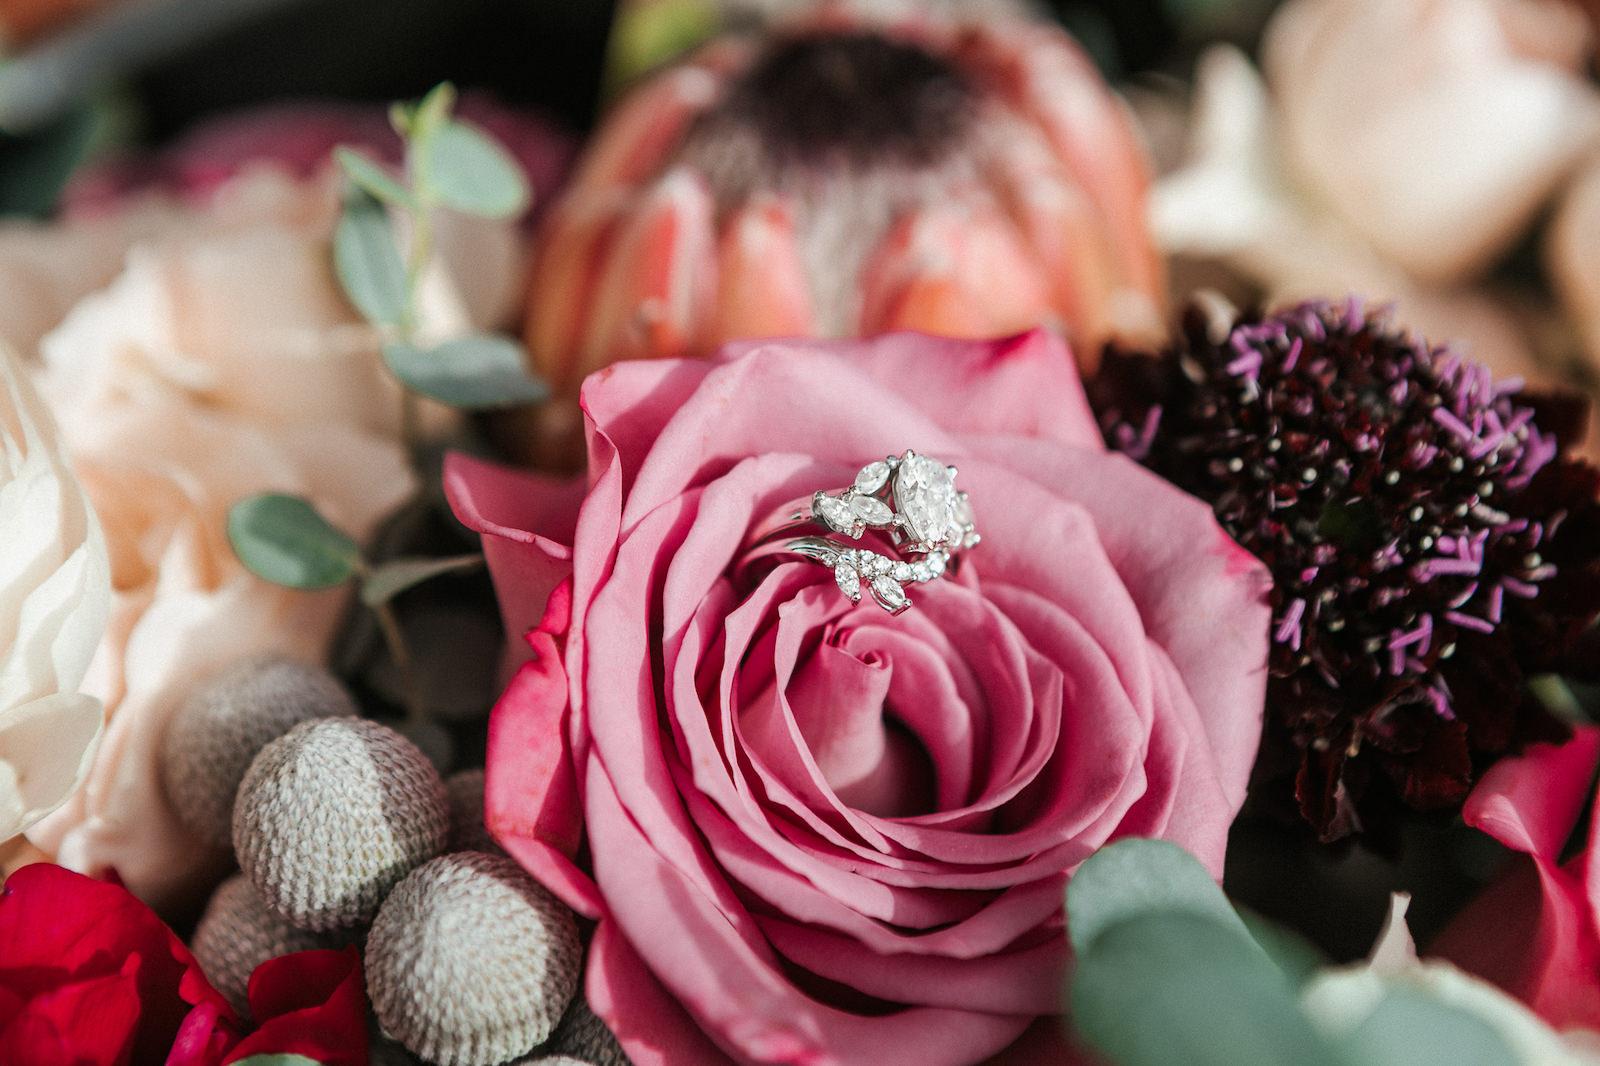 Romantic Florida Engagement Ring with Floral Design | Florida Wedding Florist: Posies Flower Truck